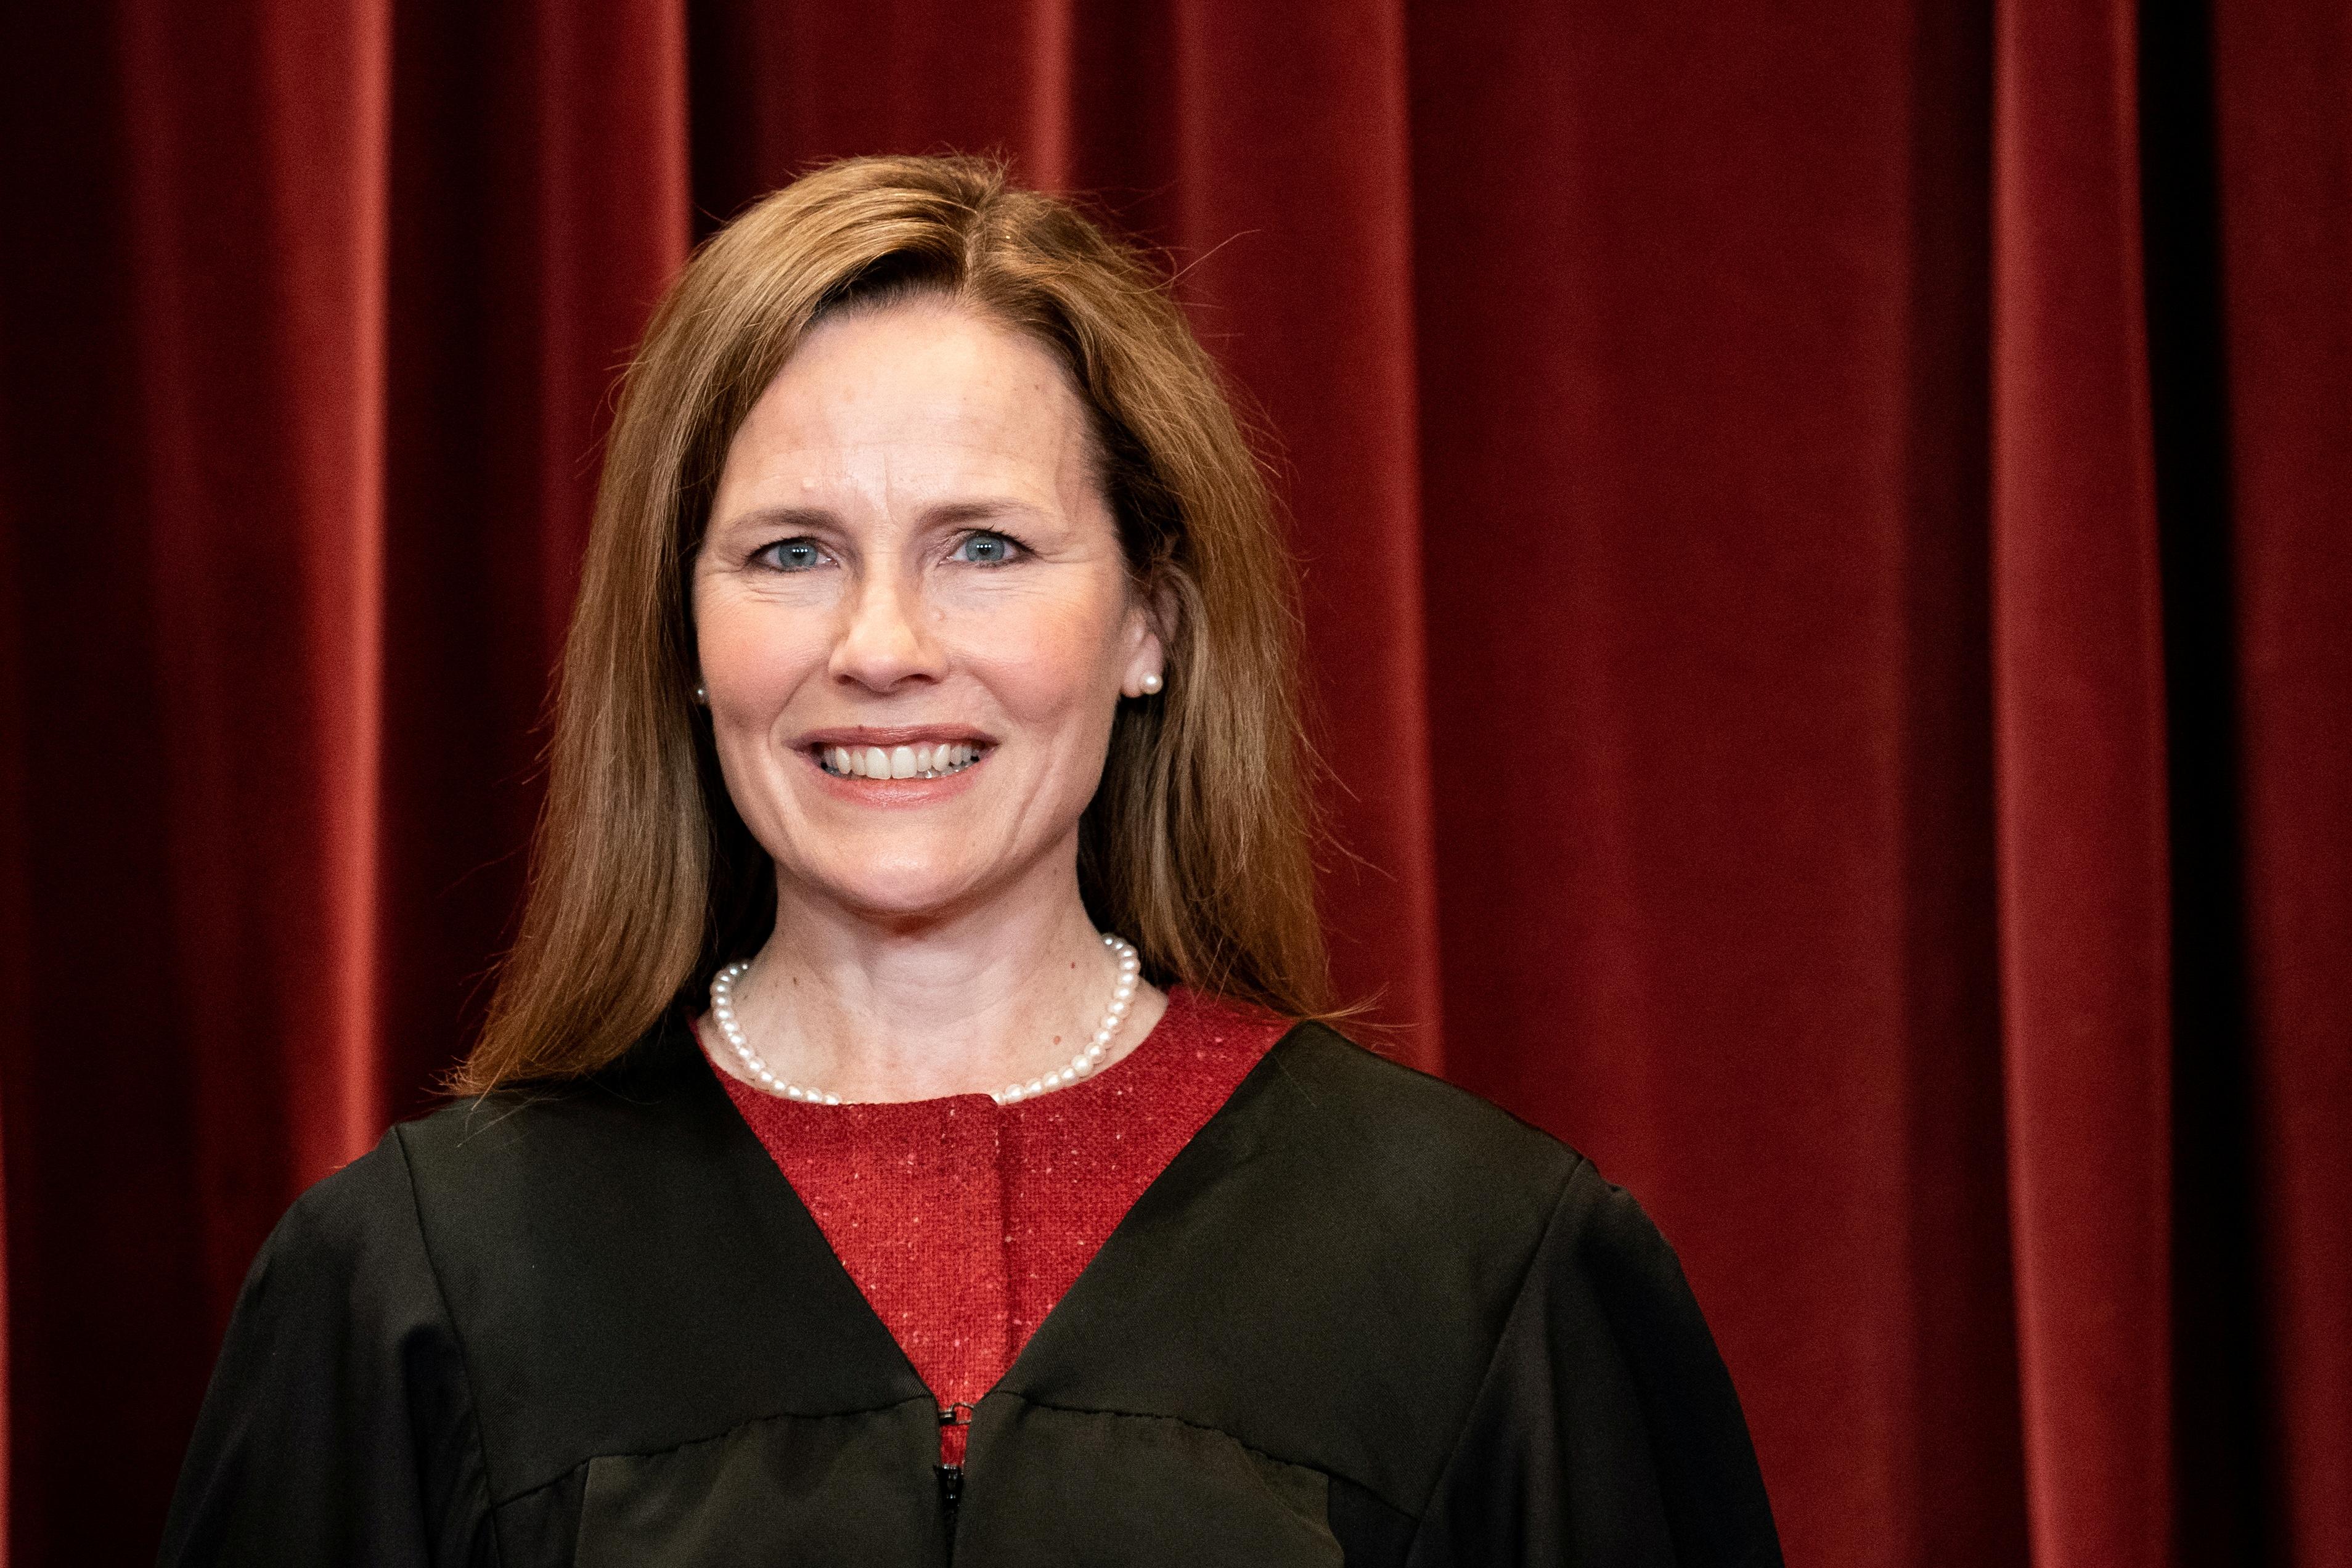 File photo: U.S. Supreme Court Justice Amy Coney Barrett . Erin Schaff/Pool via REUTERS